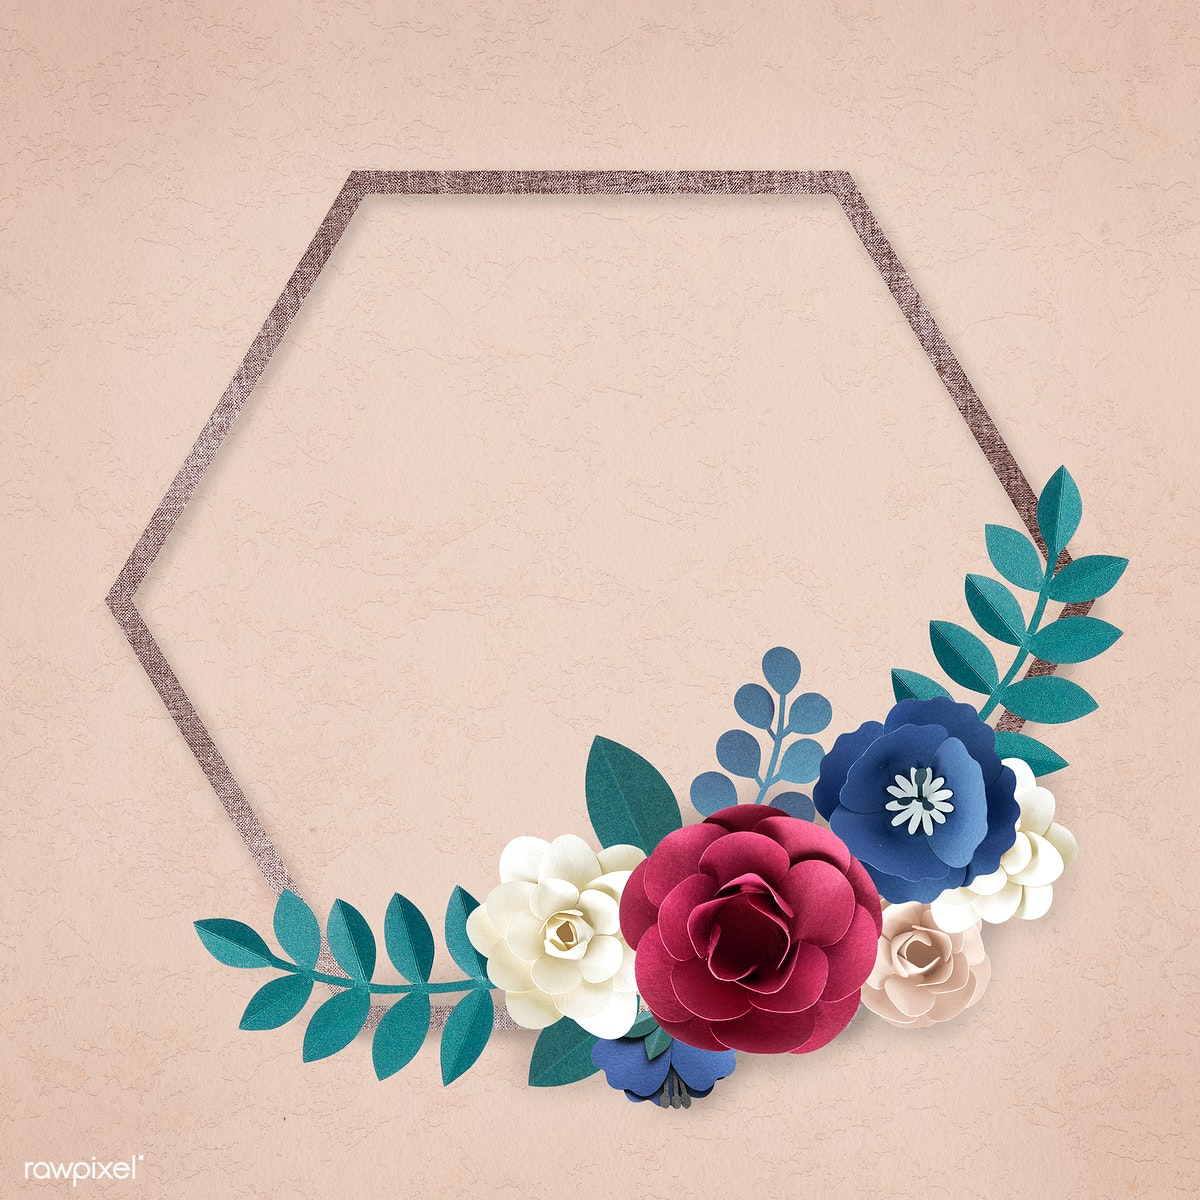 Blank Floral Frame Royalty Free Stock Illustration 845653